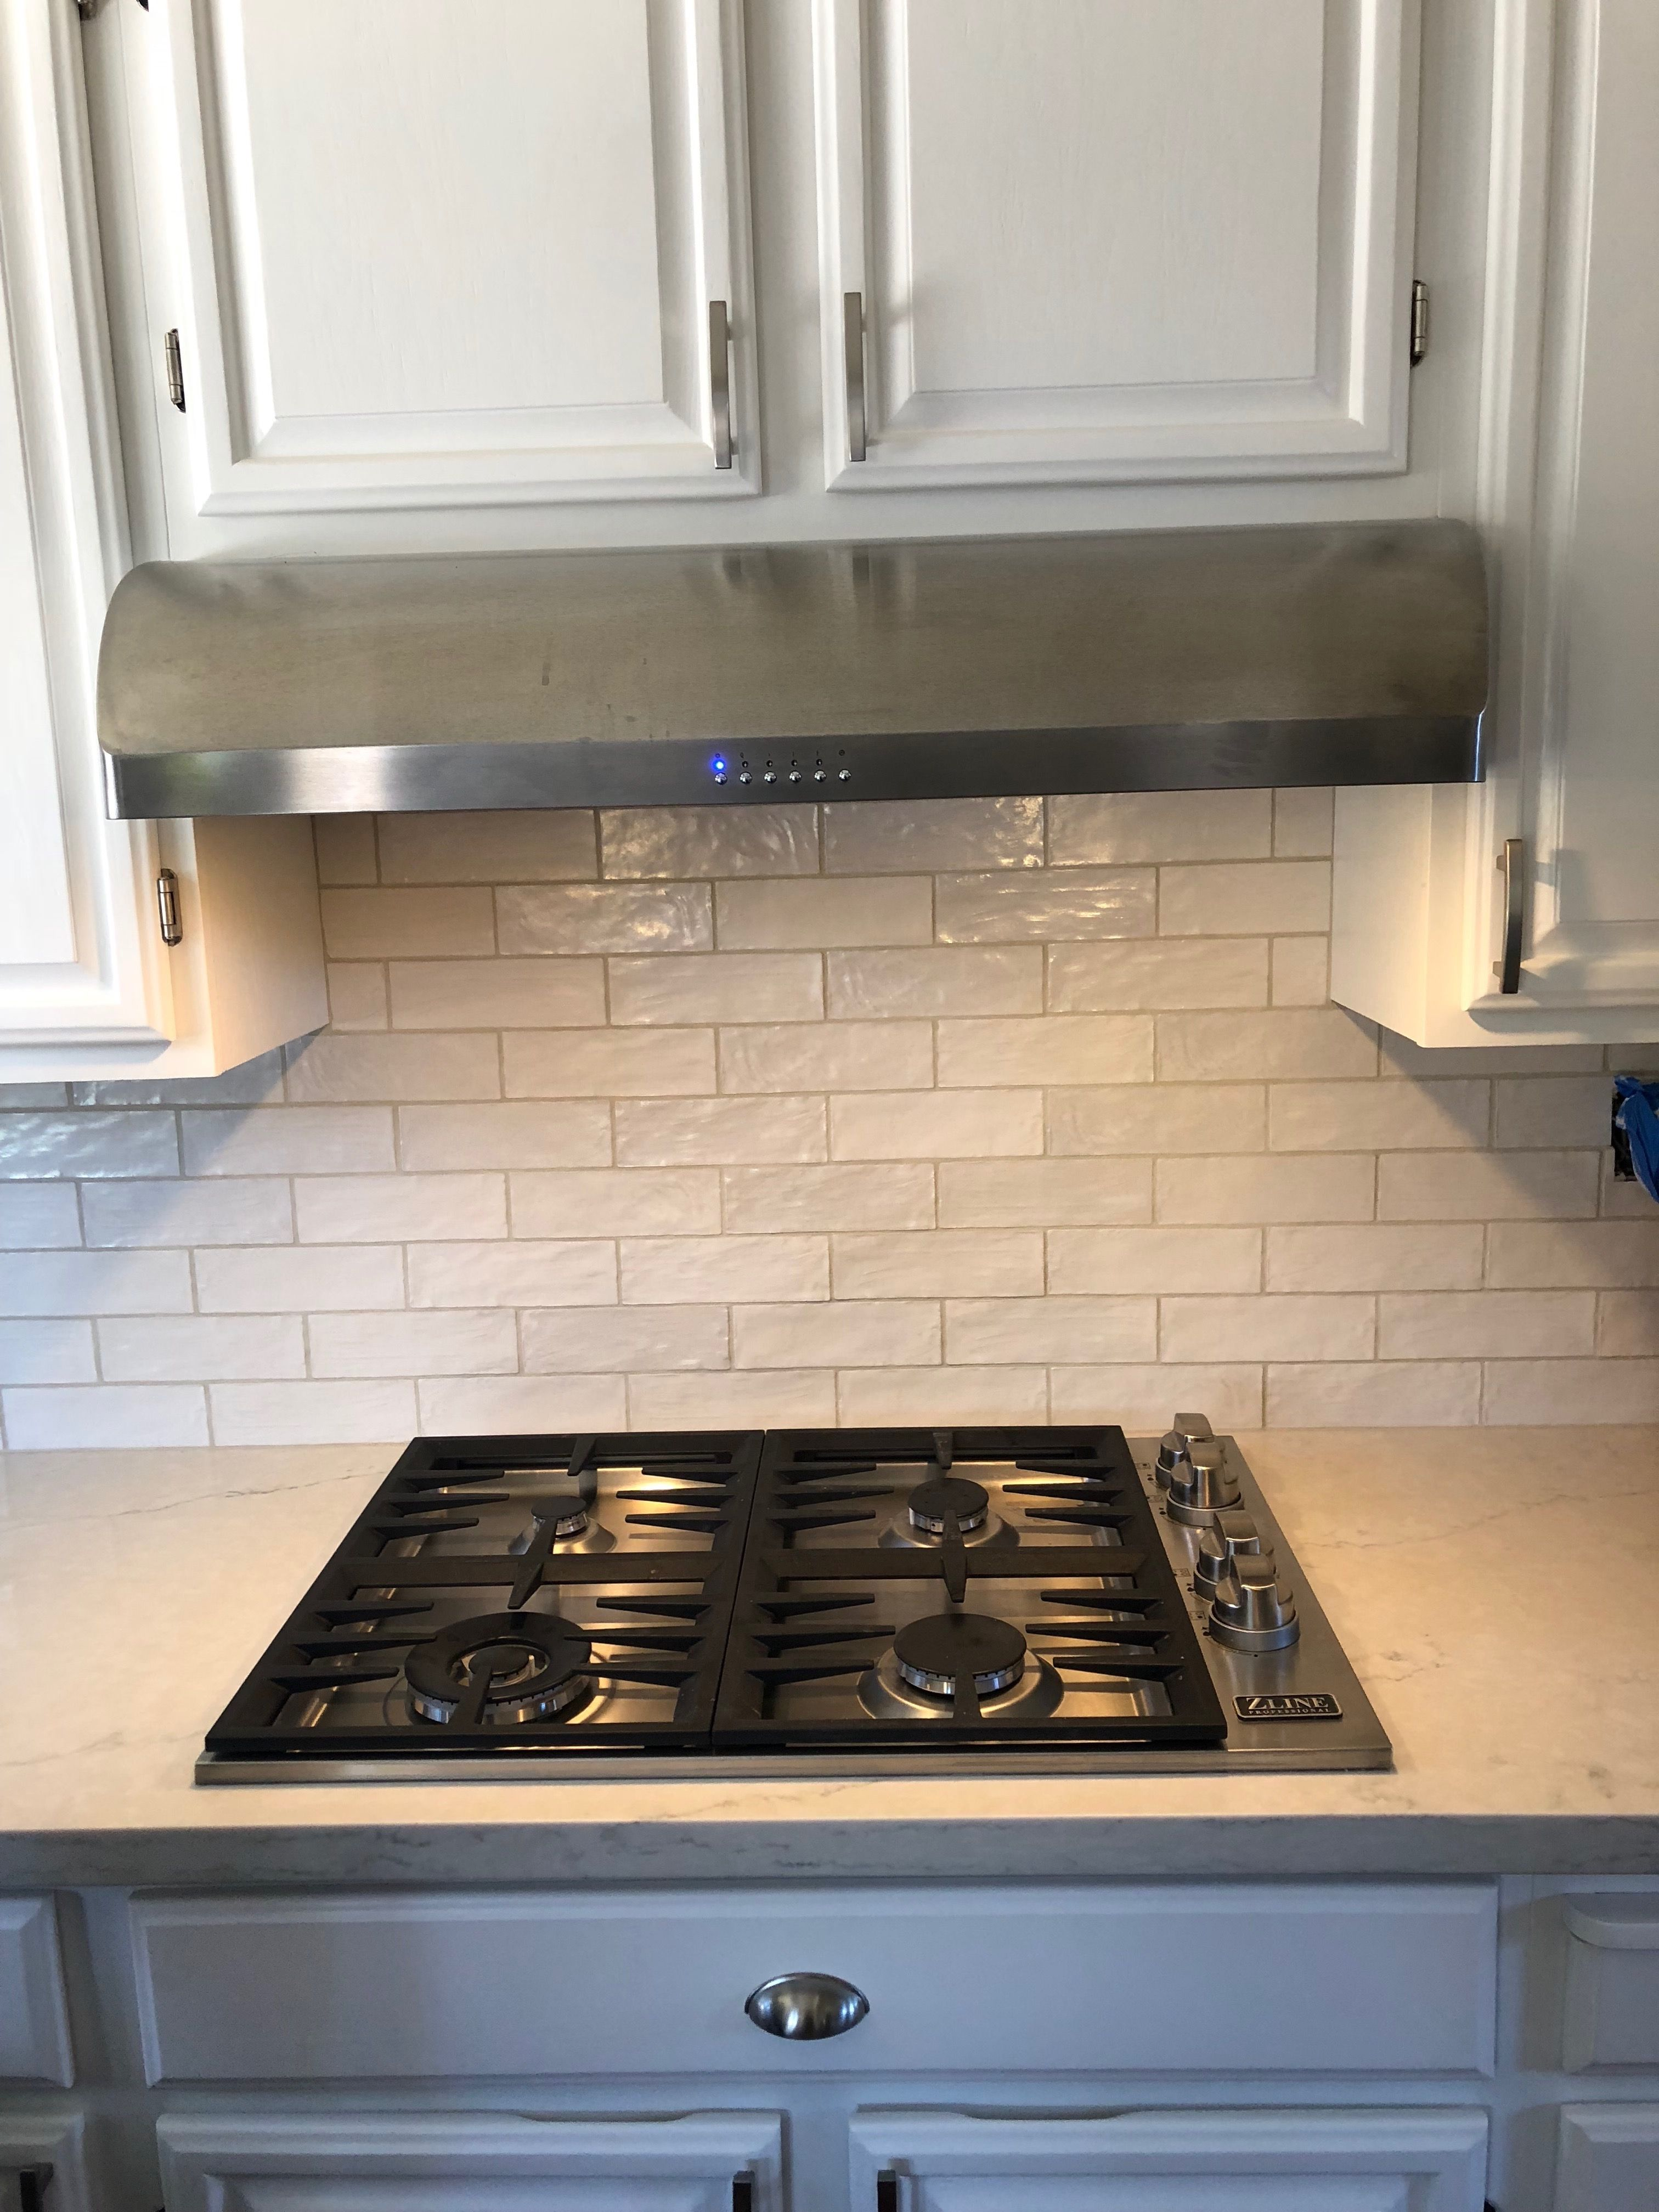 Zline 48 In Porcelain Rangetop With 7 Gas Burners Rt48 Gas Stove Top Wall Mount Range Hood Kitchen Design Trends